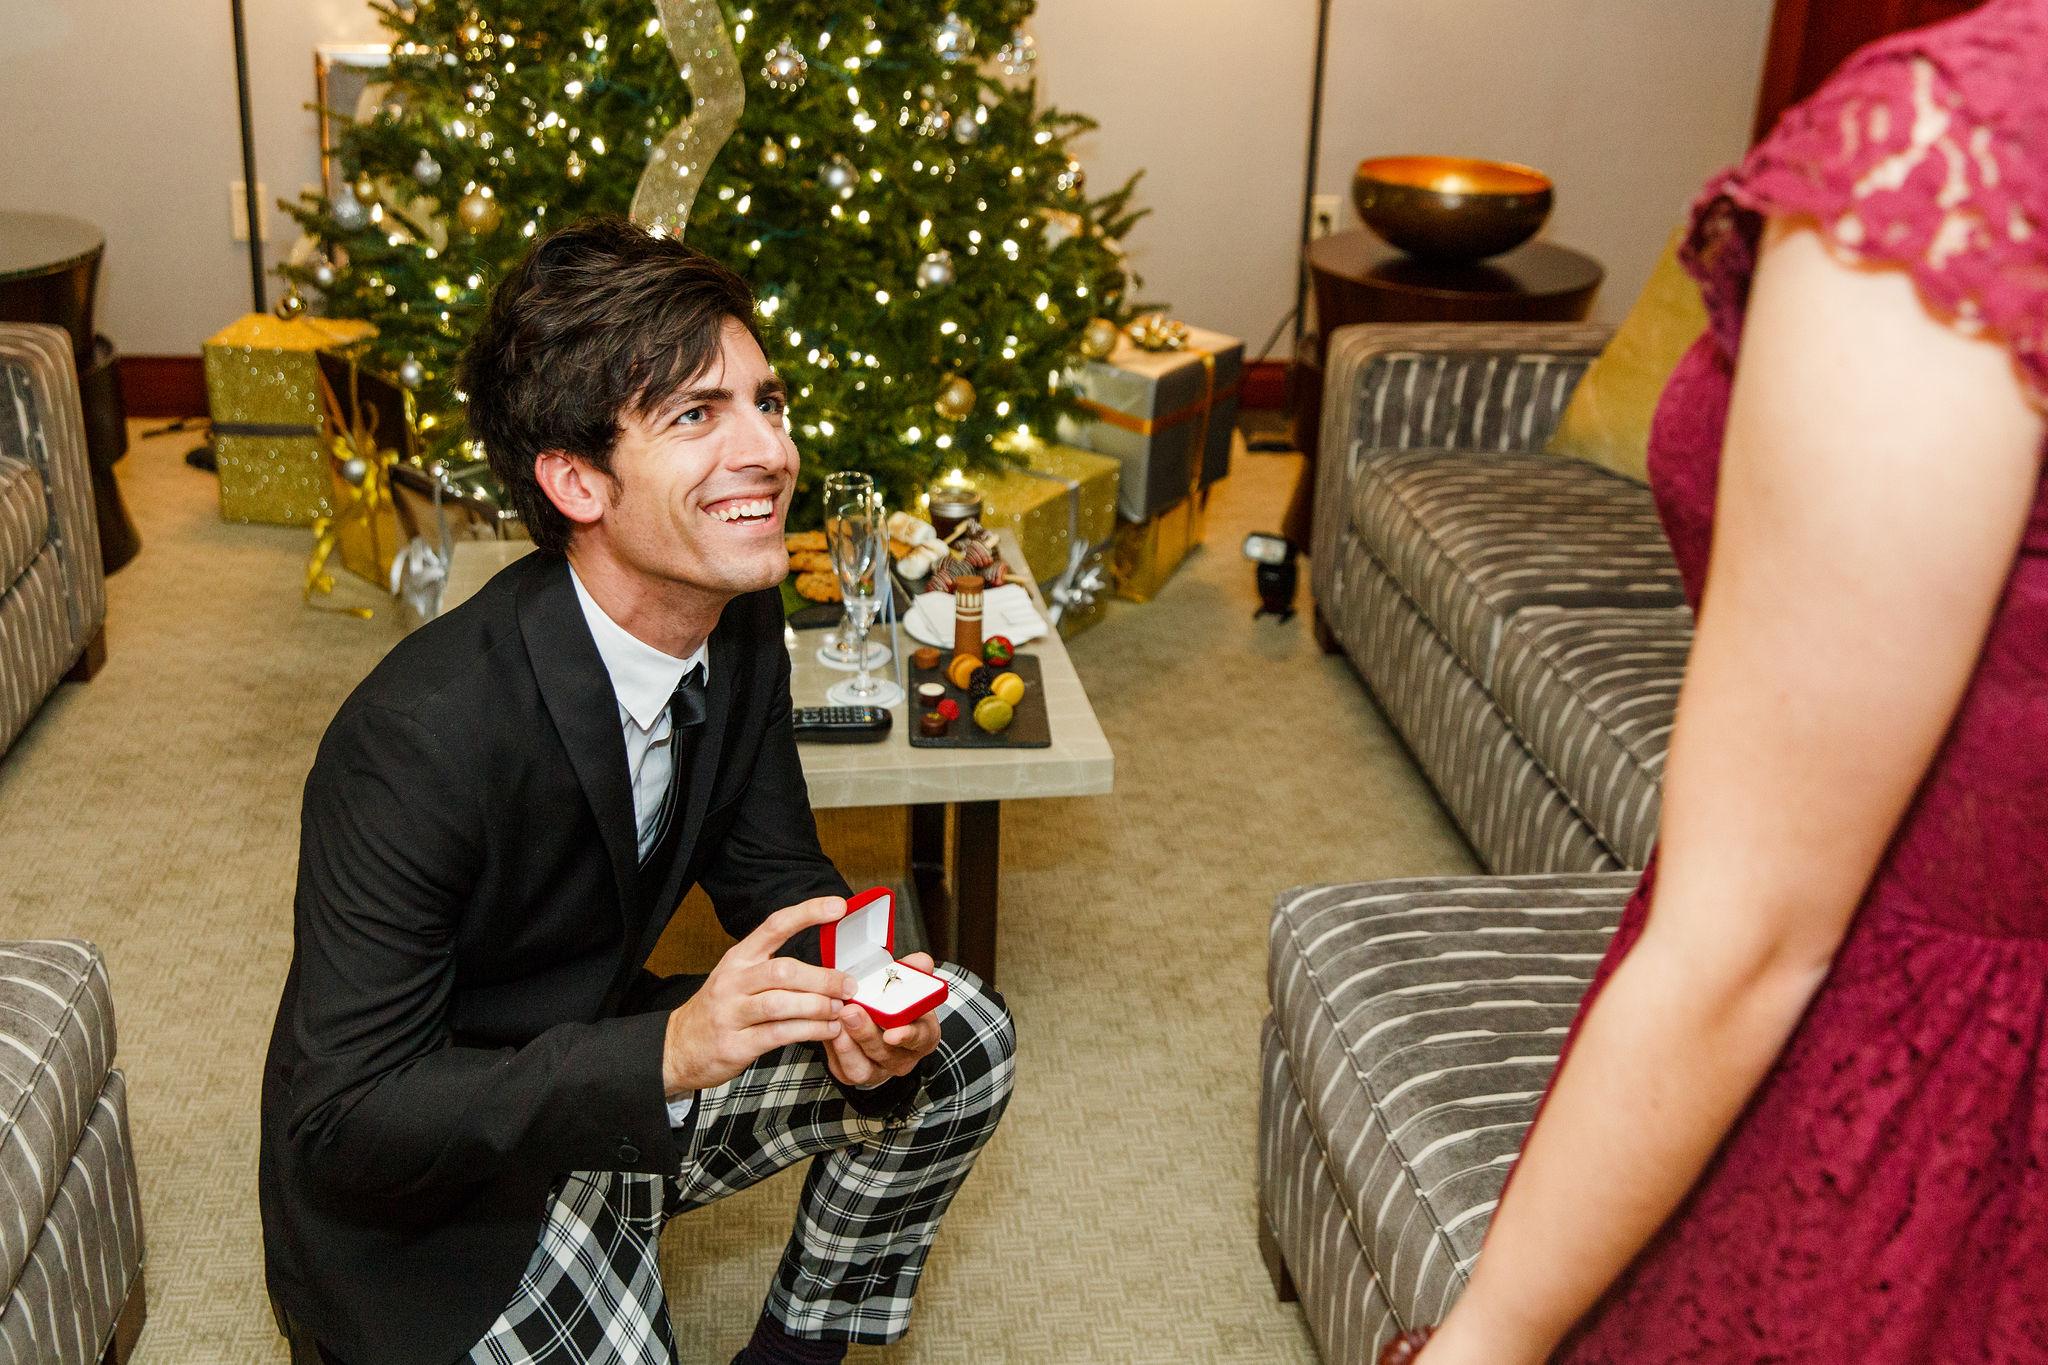 Christmas-Surprise-Proposal-Photographer